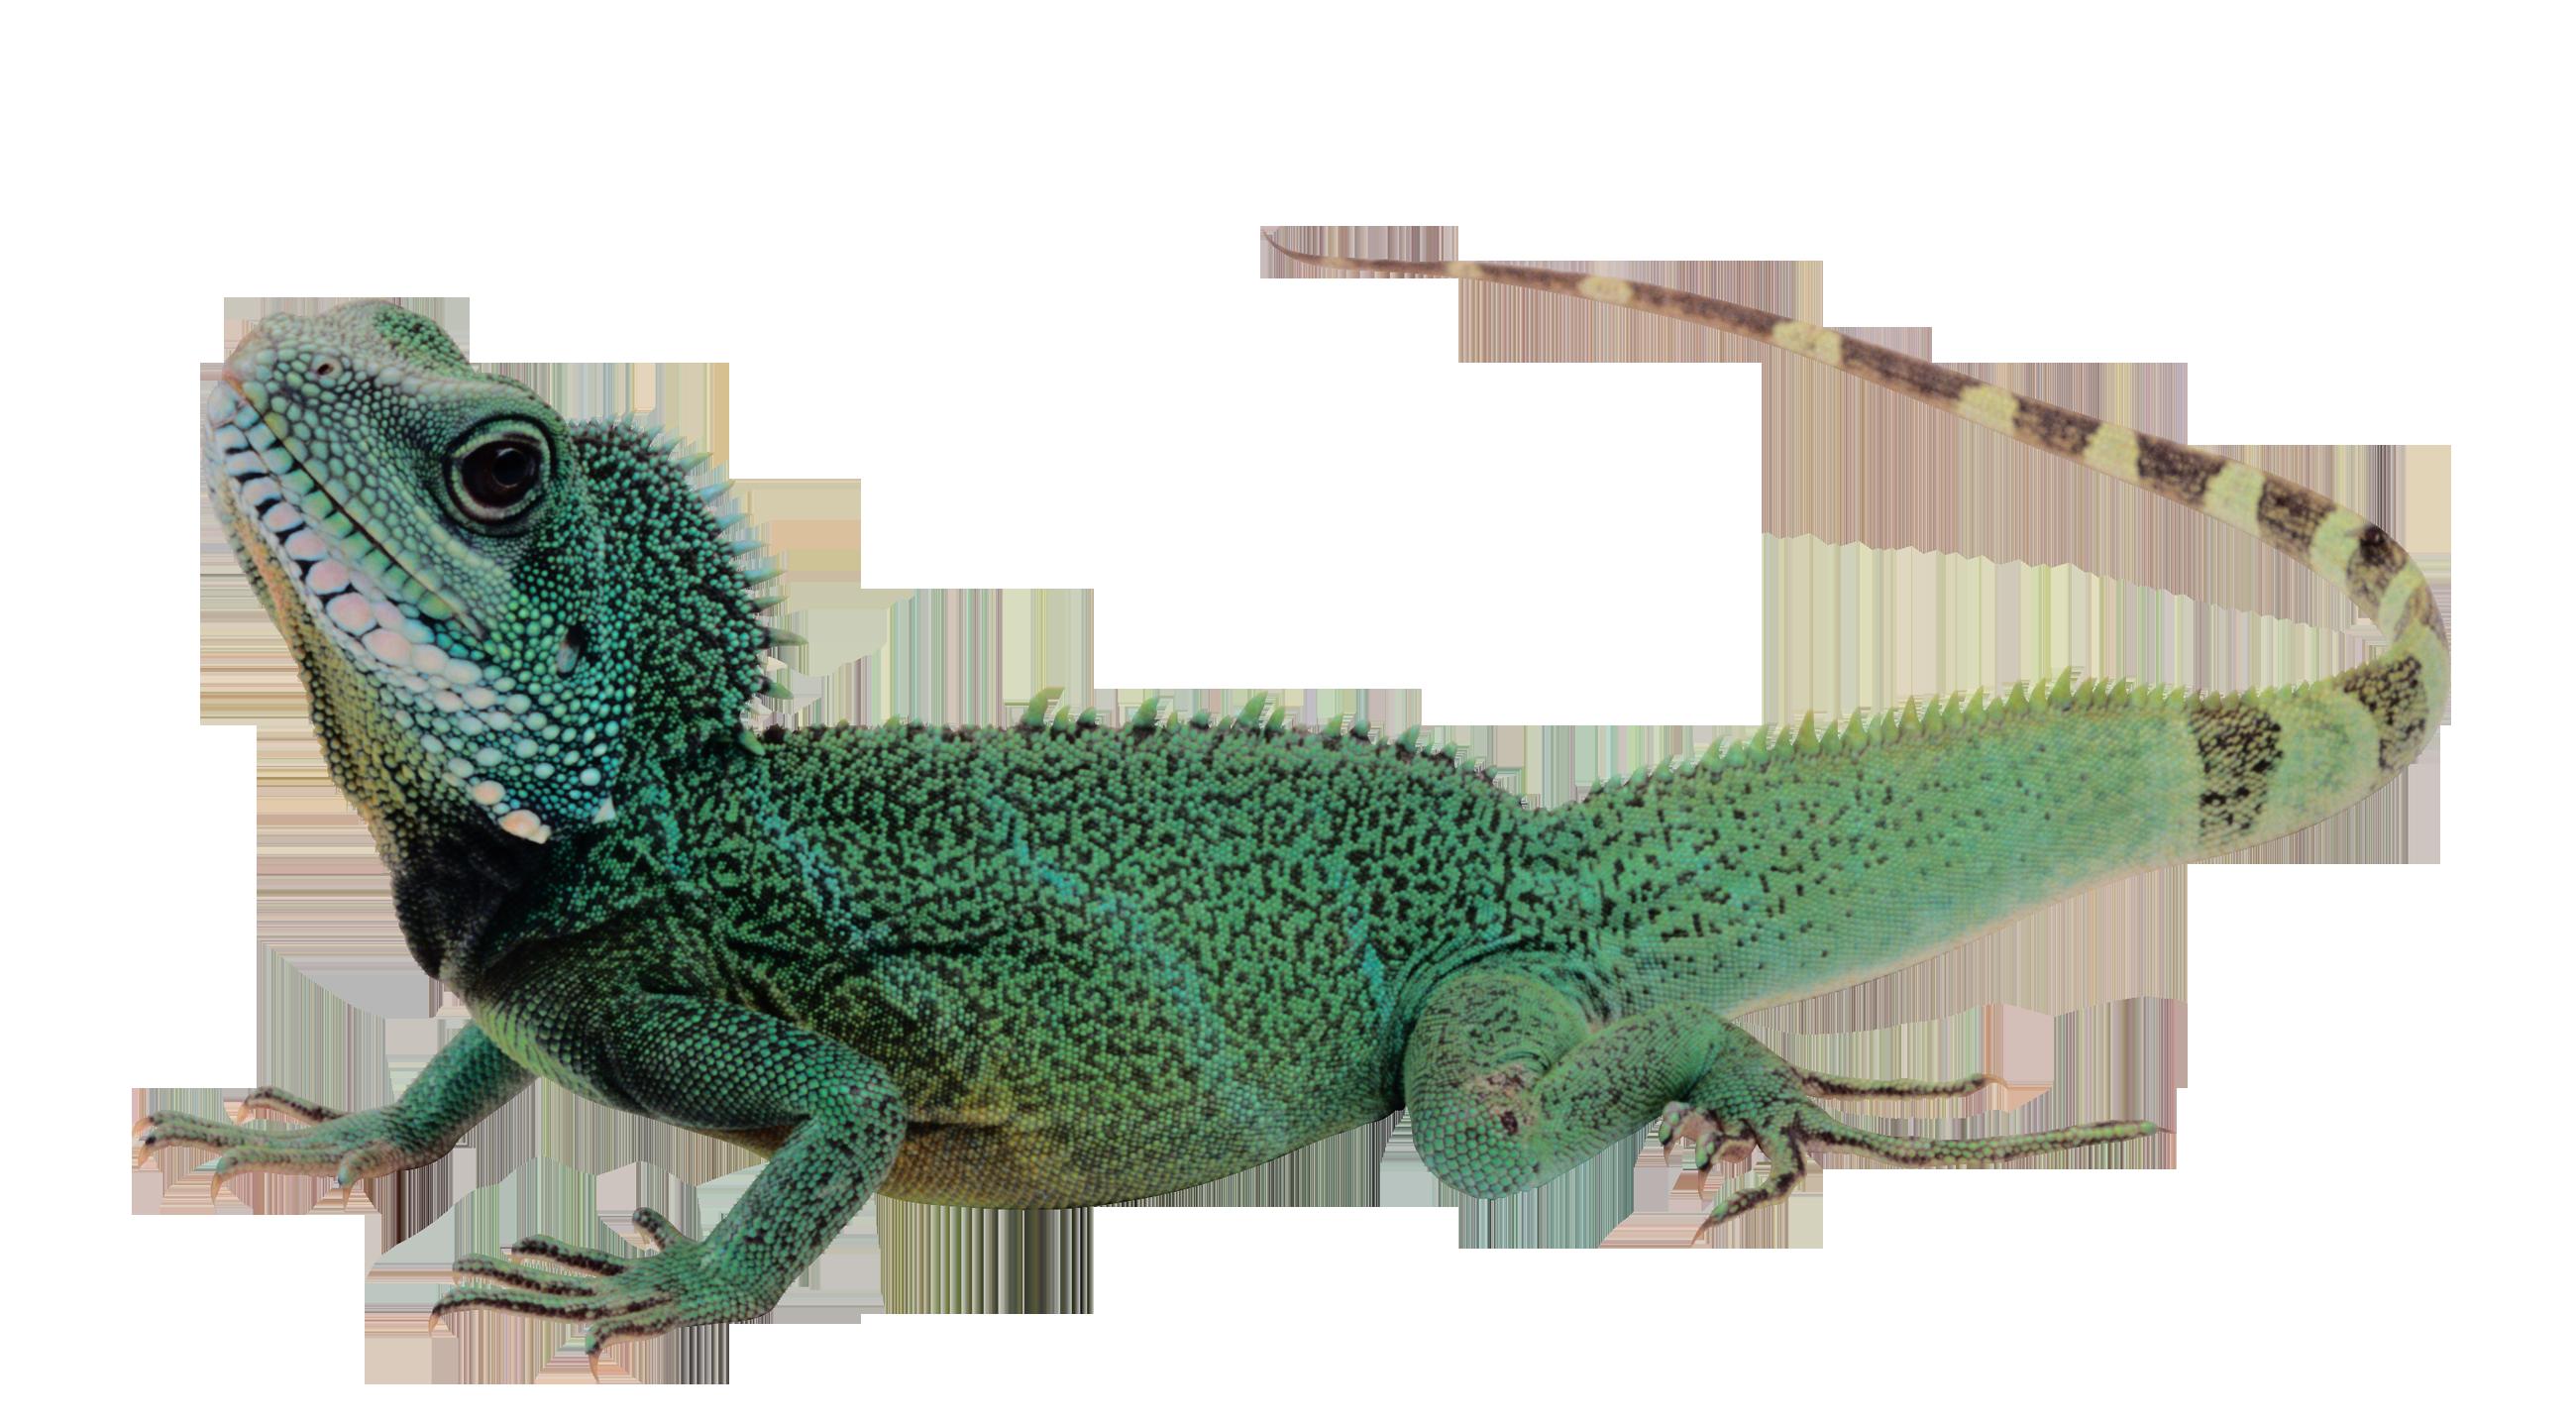 Gecko clipart transparent background. Lizard png